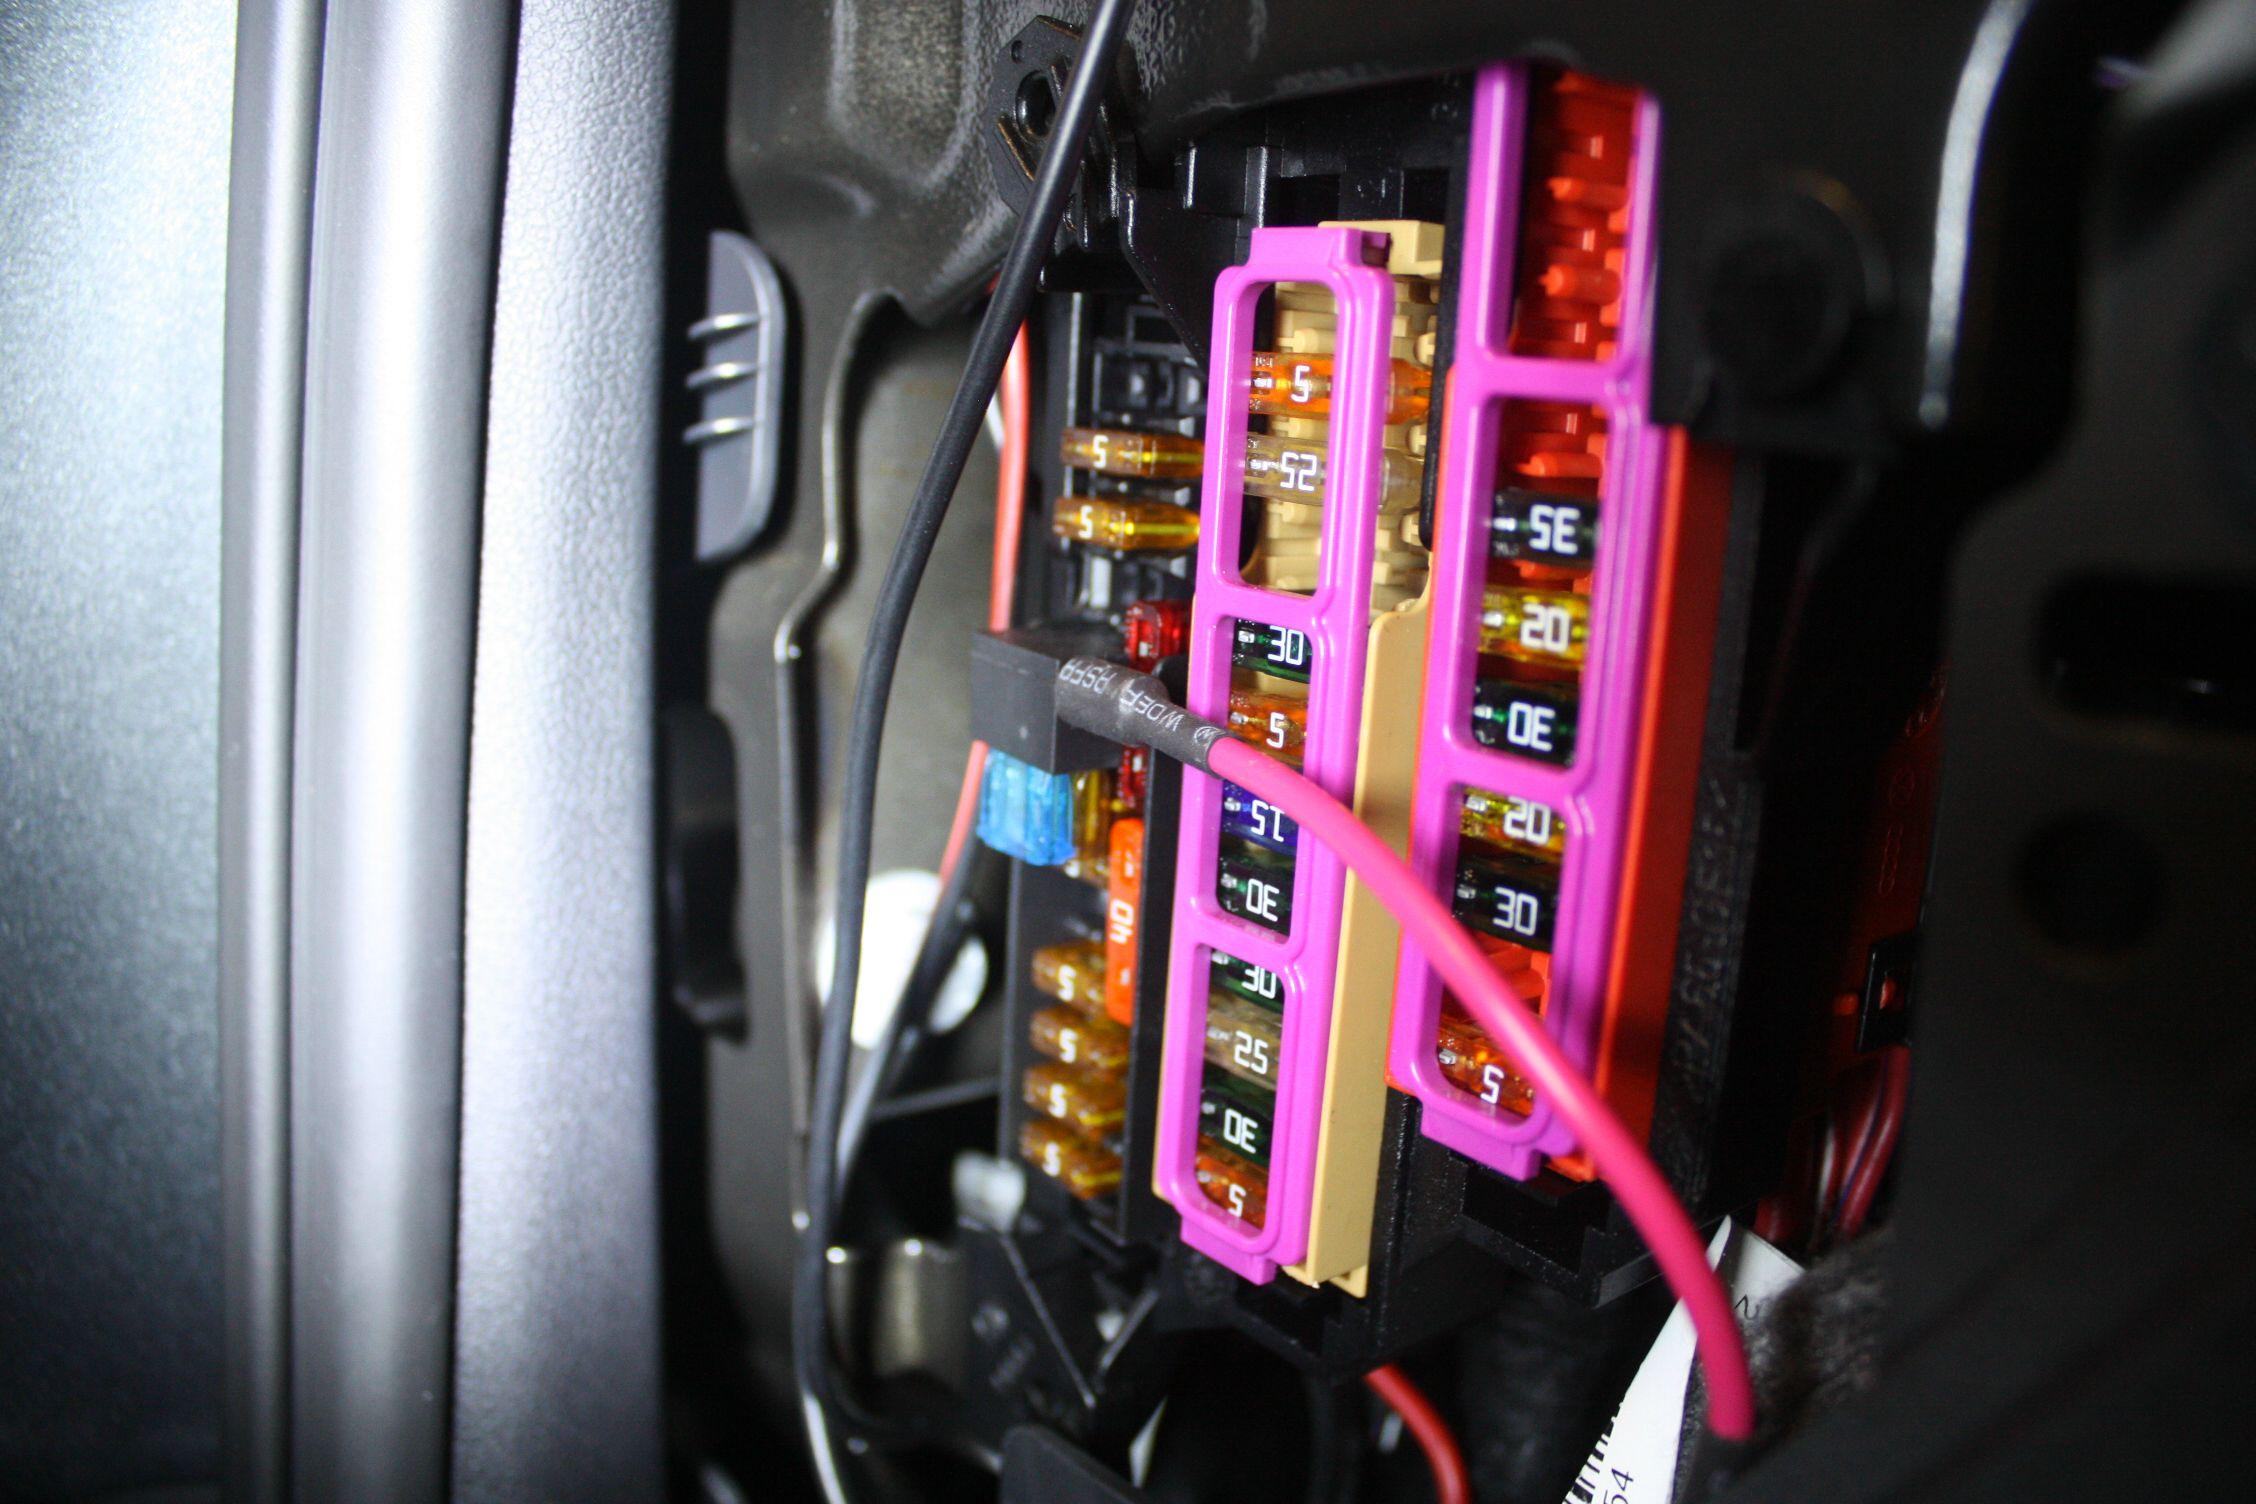 Audi A4 Fuse Box 2013 Silverado Transmission Wiring Diagram For Wiring Diagram Schematics